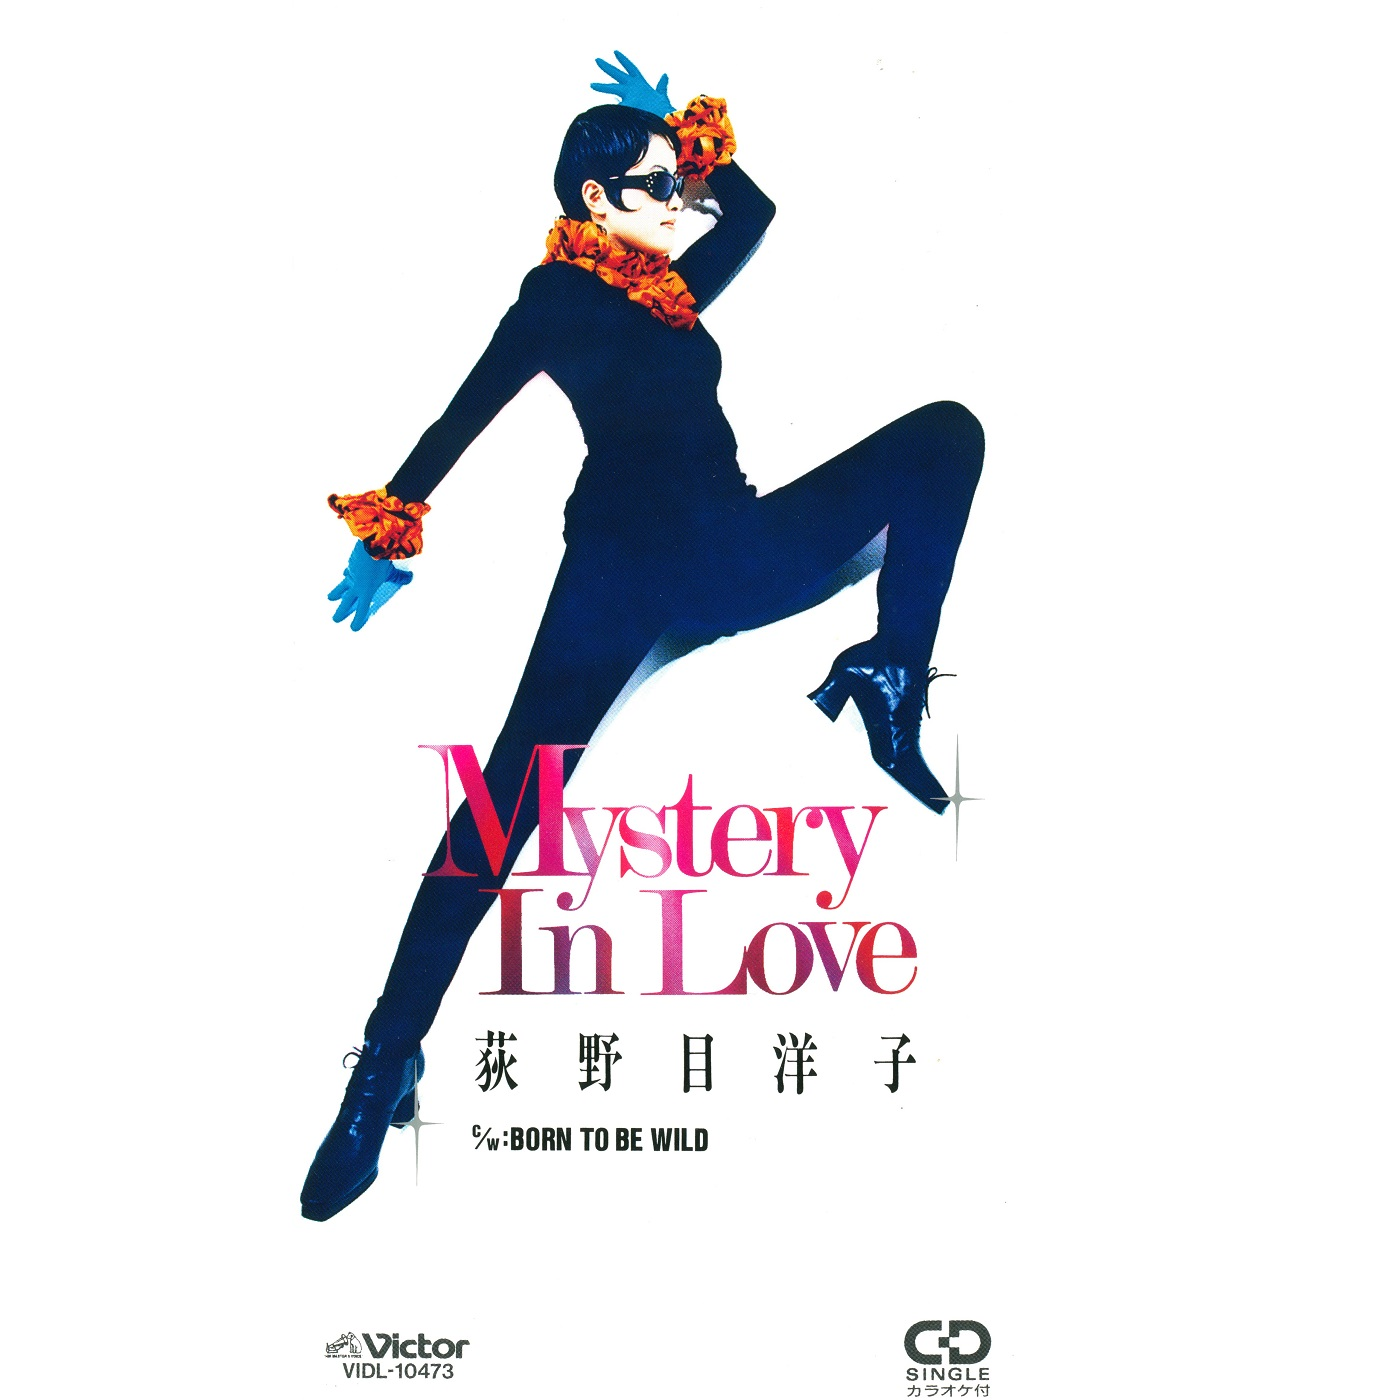 Mystery in love